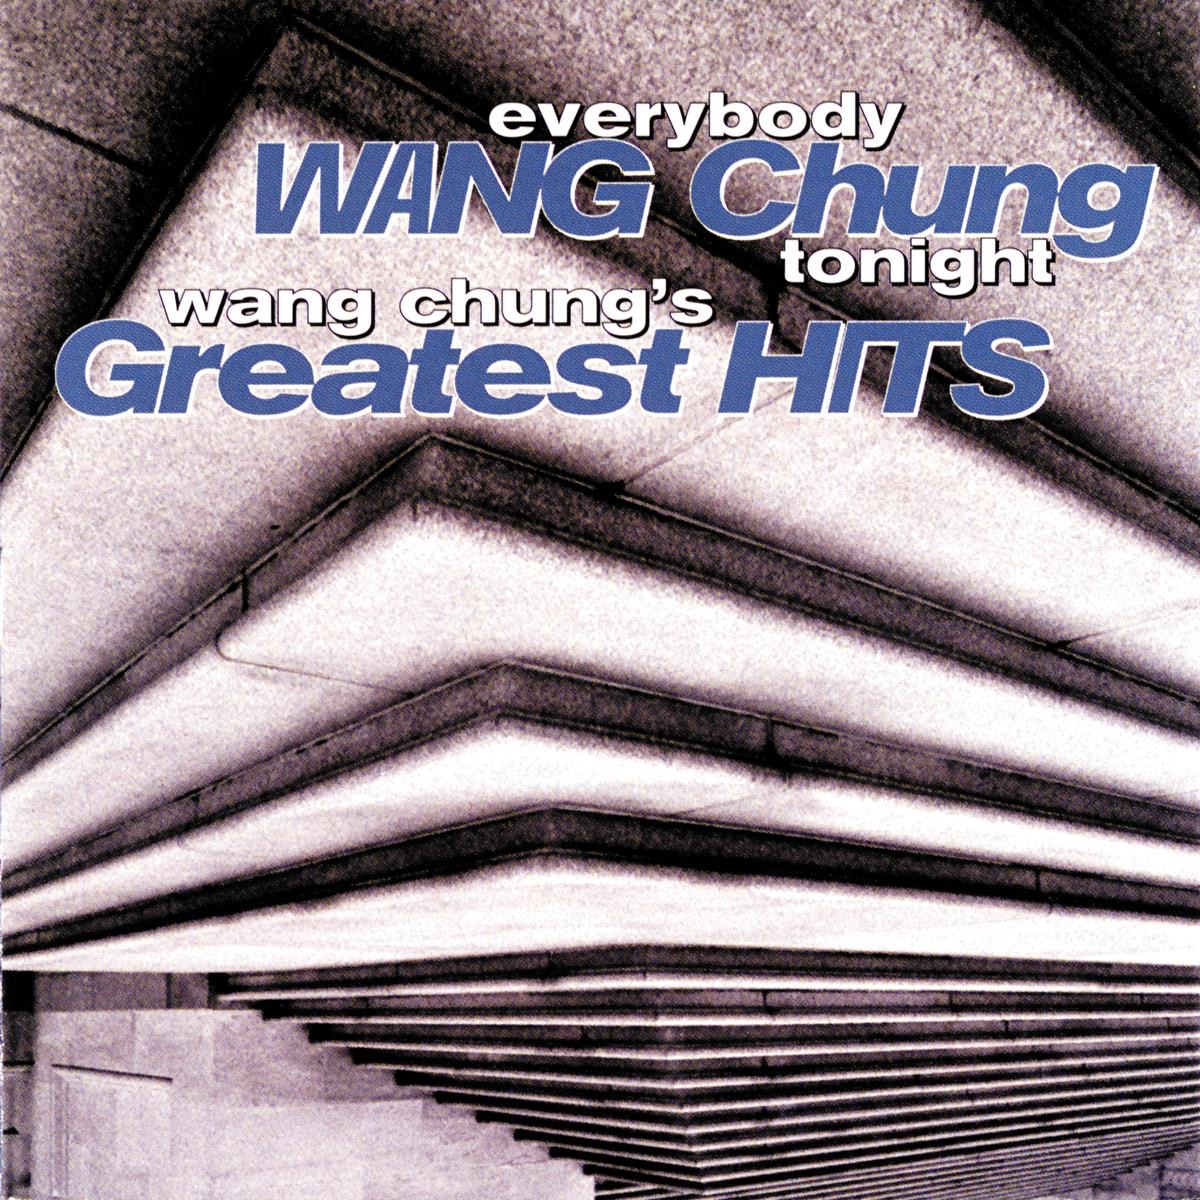 Wang Chung - Everybody Wang Chung Tonight - Wang Chung's Greatest Hits